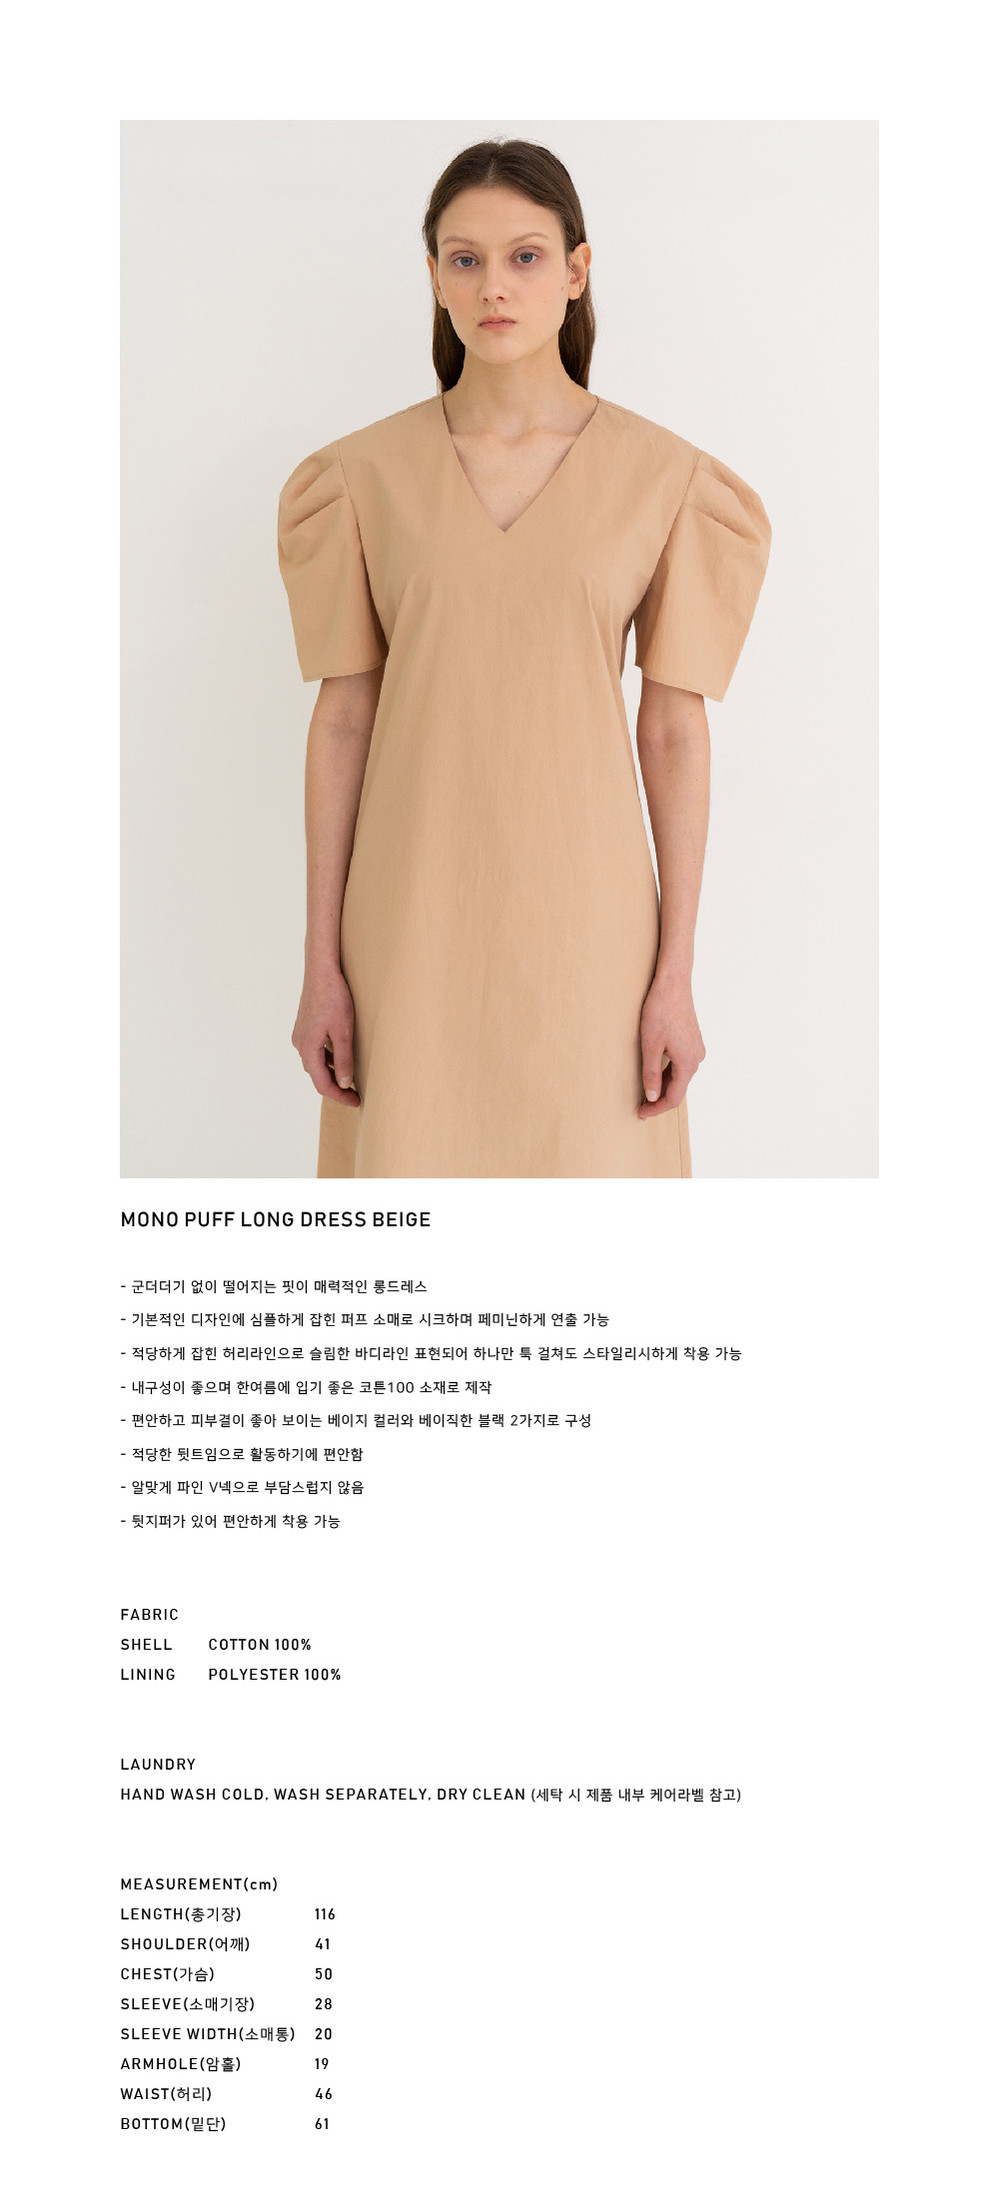 MONO PUFF LONG DRESS BEIGE